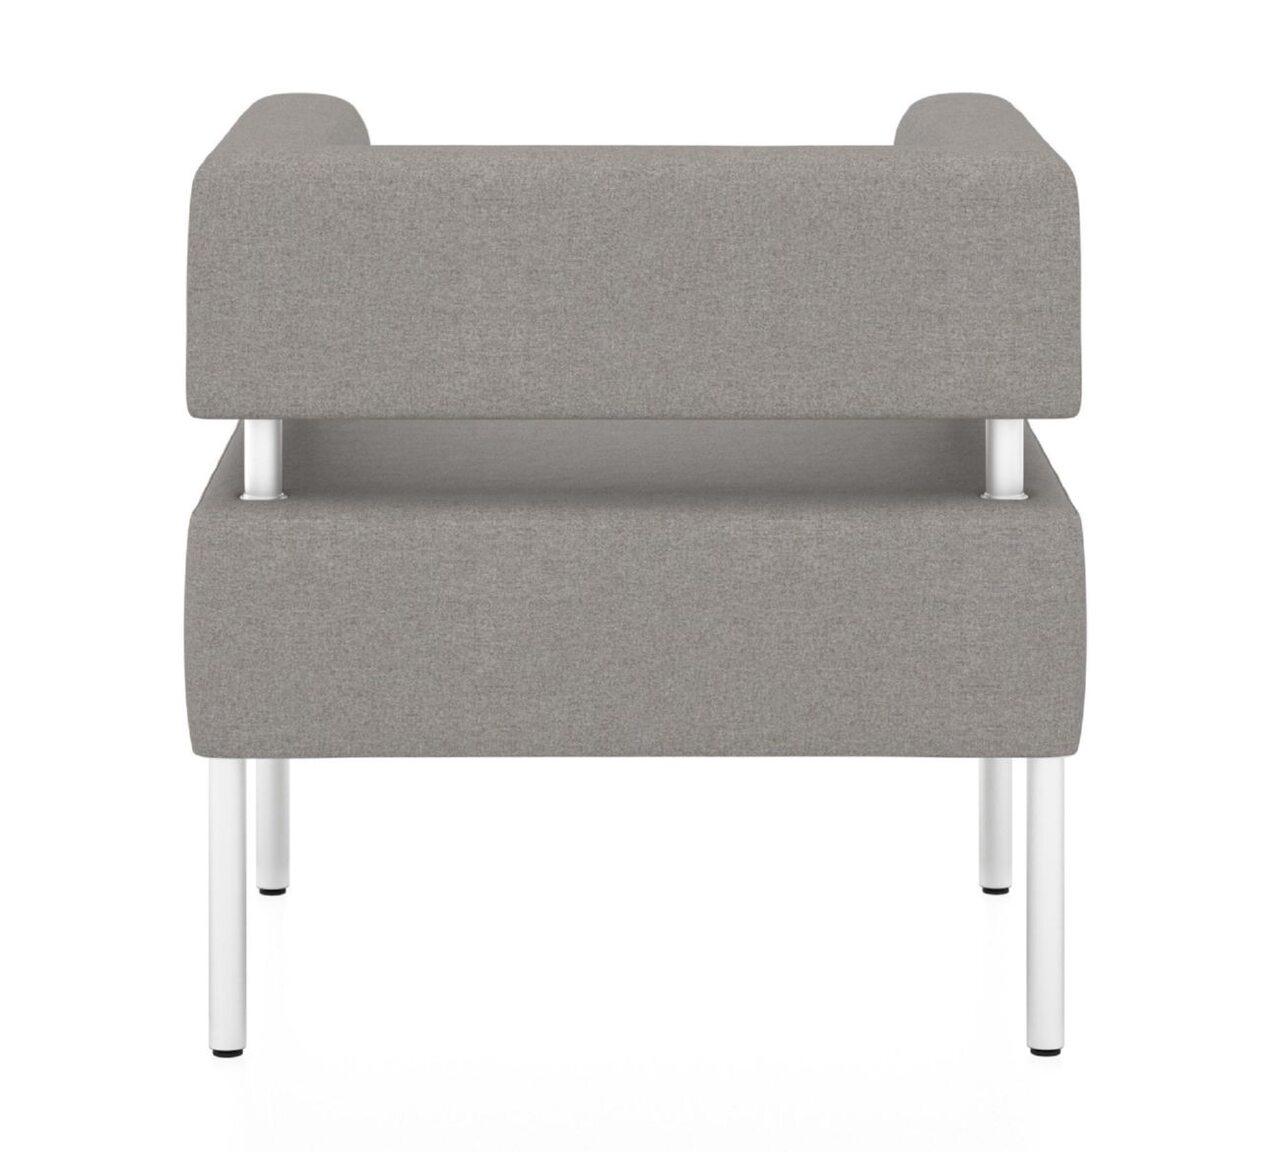 Кресло  МС 74x63x80 - фото 3